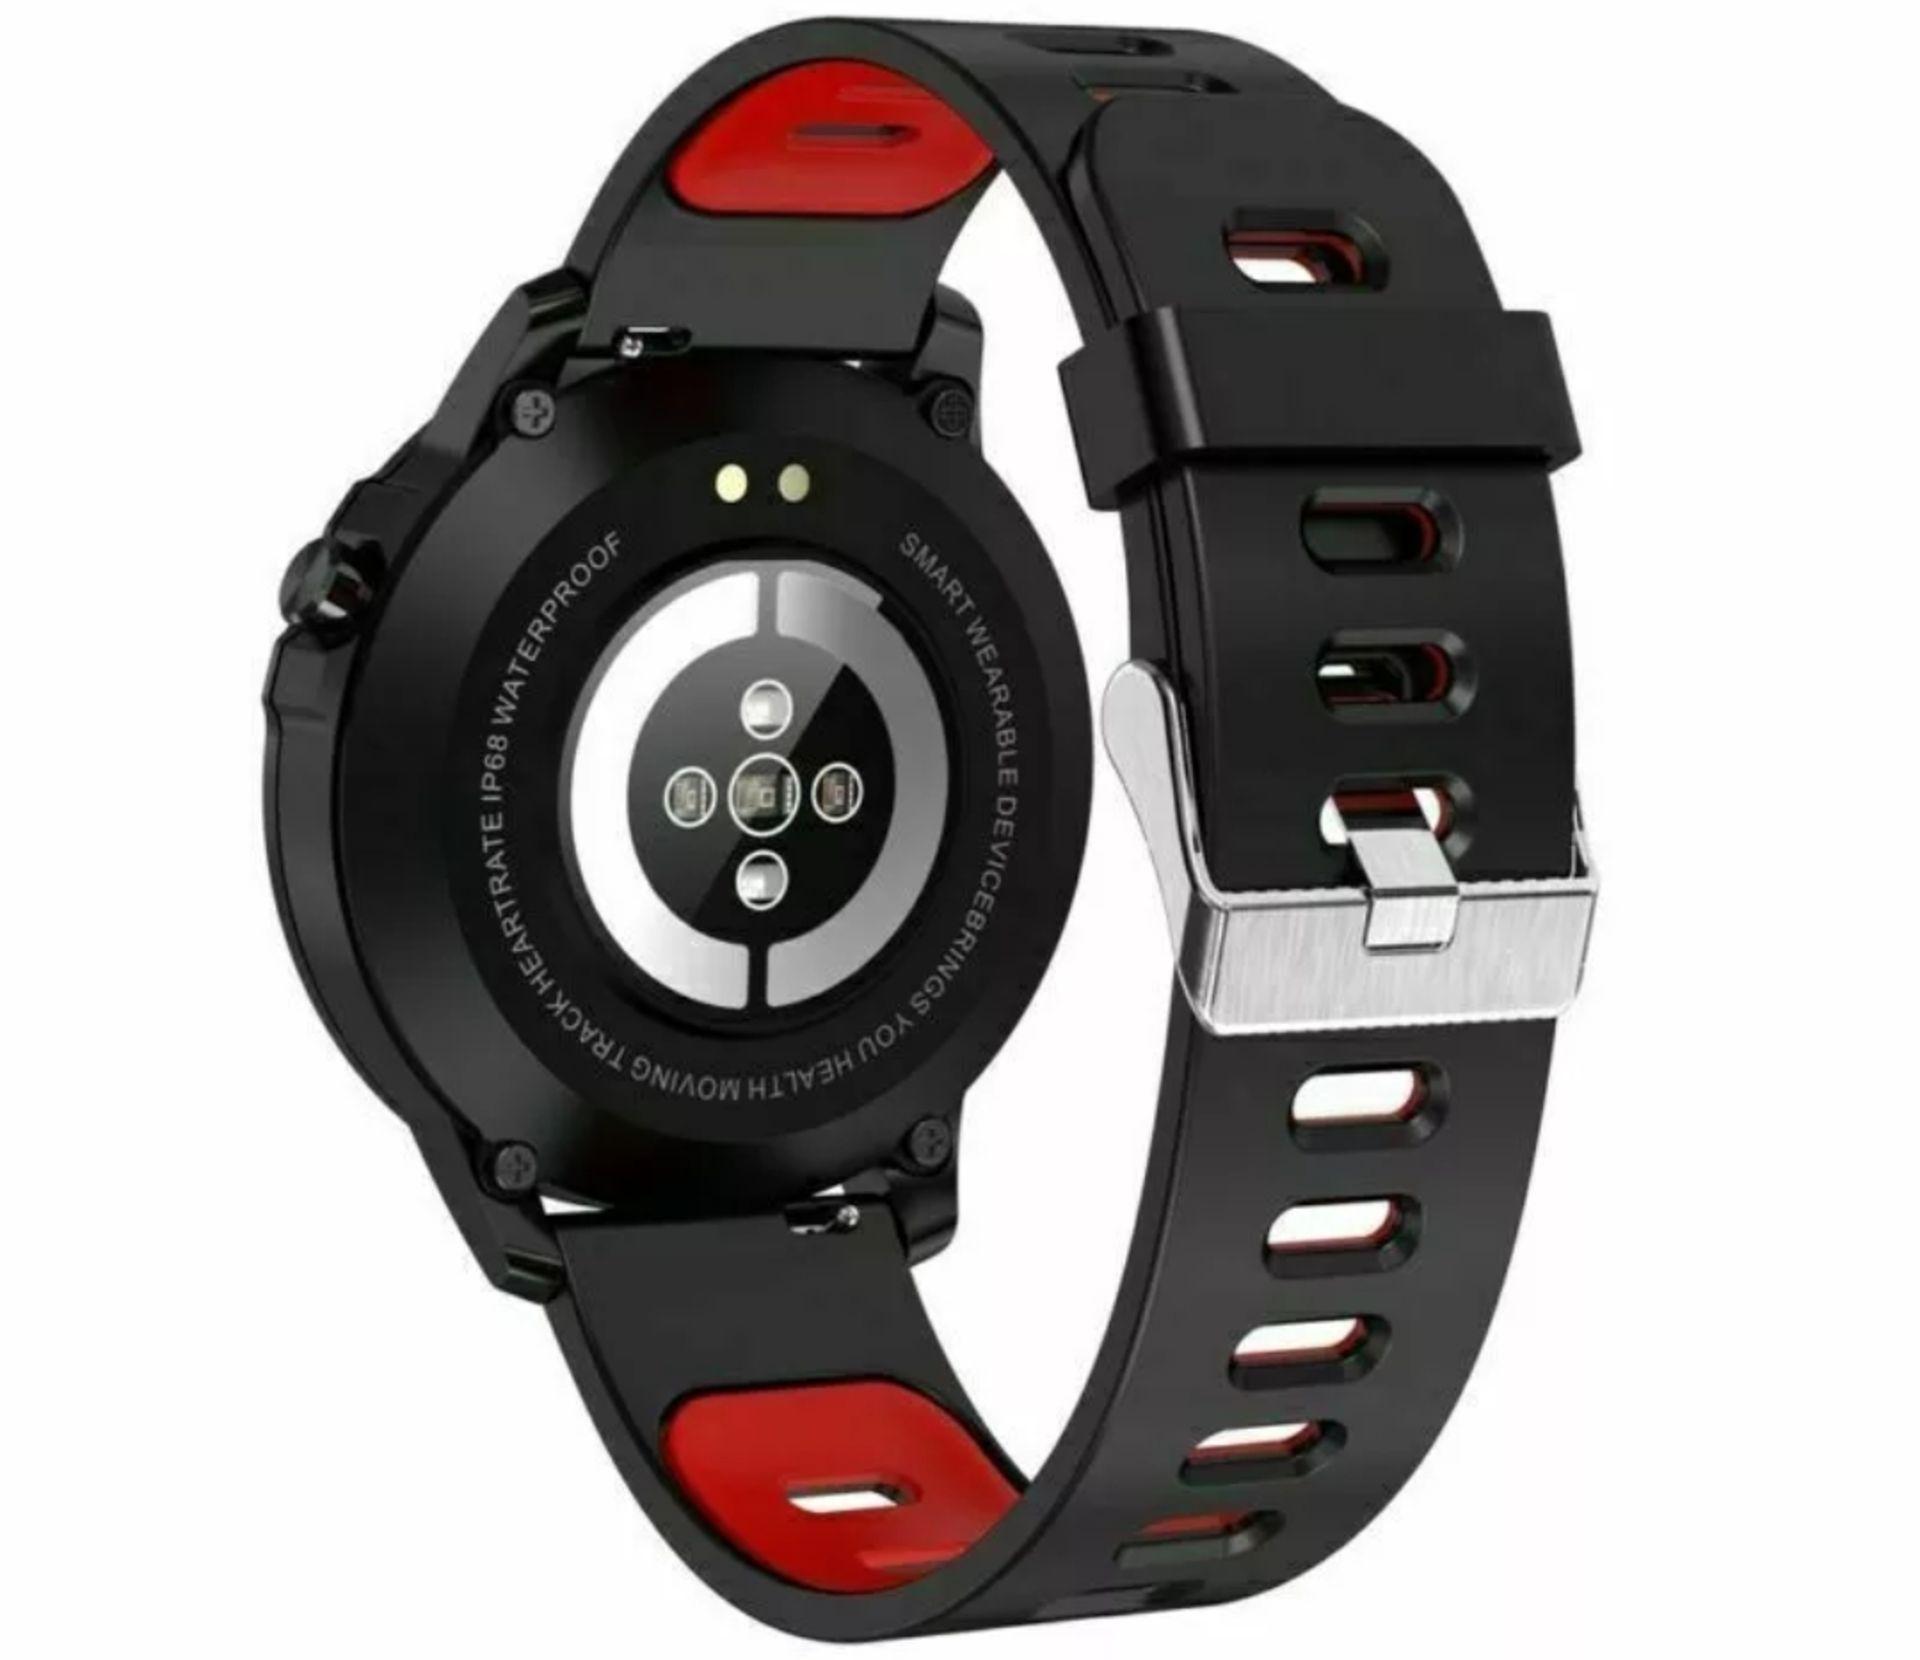 Lot 154 - L8 Blood Pressure, Oxygen, Heart Rate Monitor, Bt4.0 Ip68 Smart Watch - Grey/Black Strap